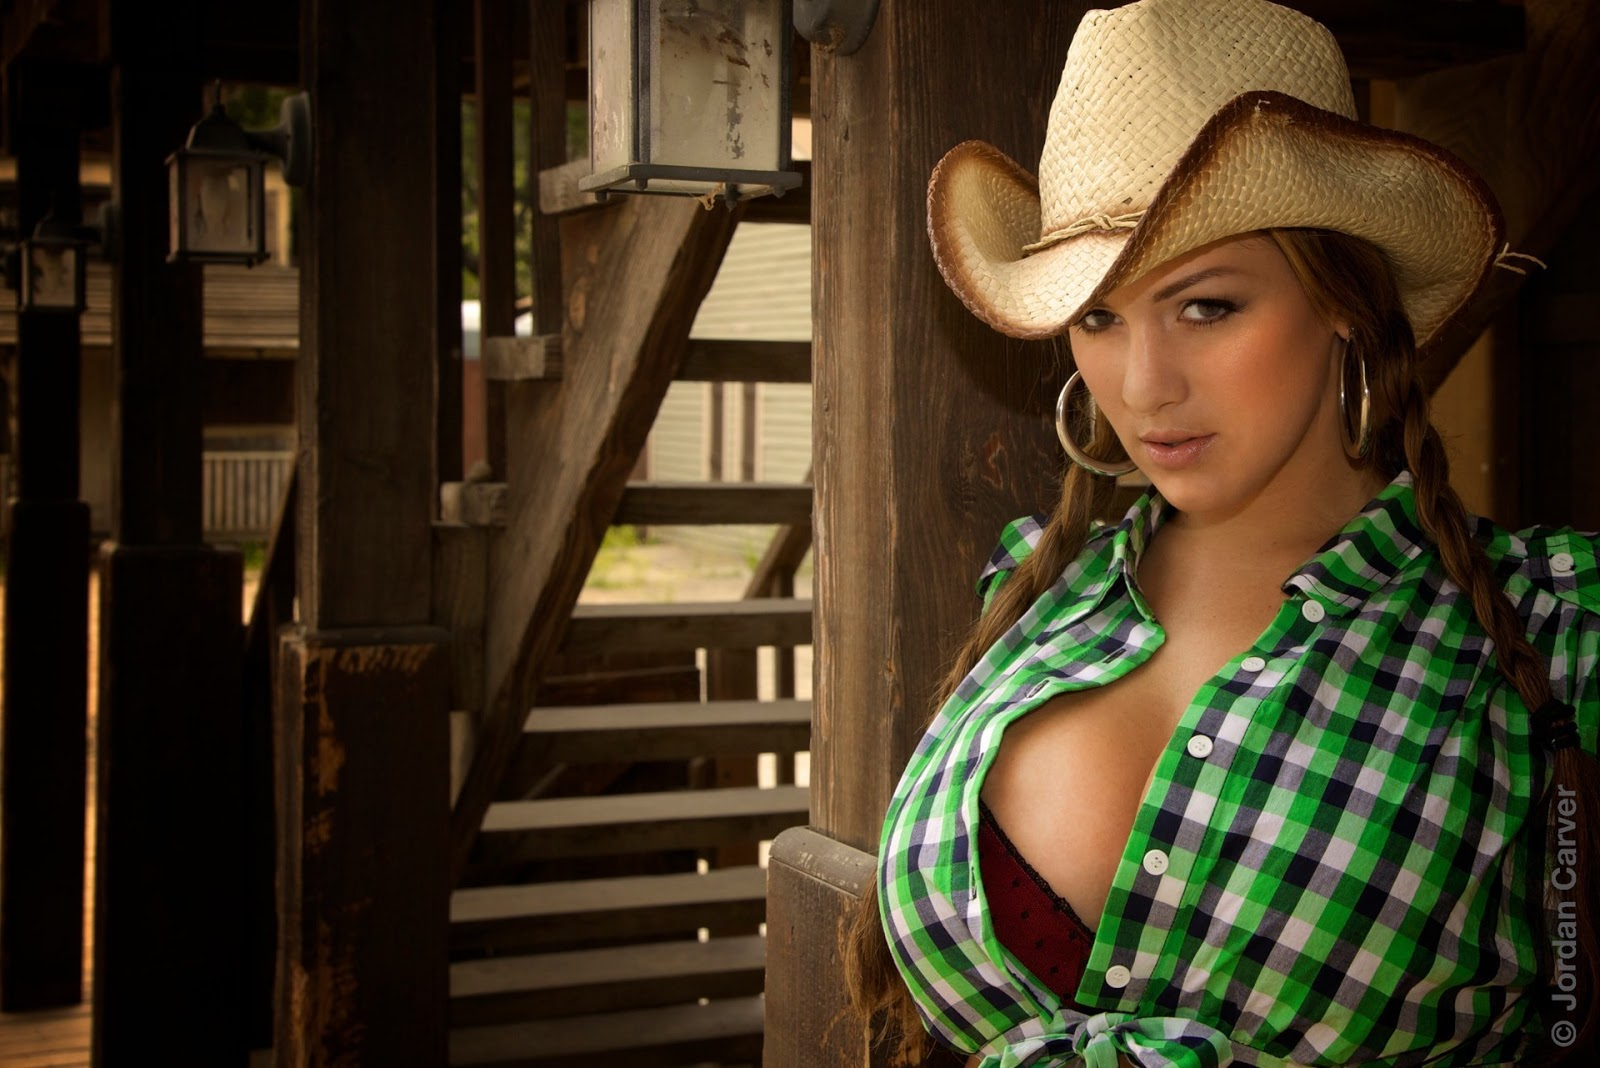 Girl With Guns Hd Wallpapers Jordan Carver Cowgirl Hot Sexy Photo Shoot Damn Sexy